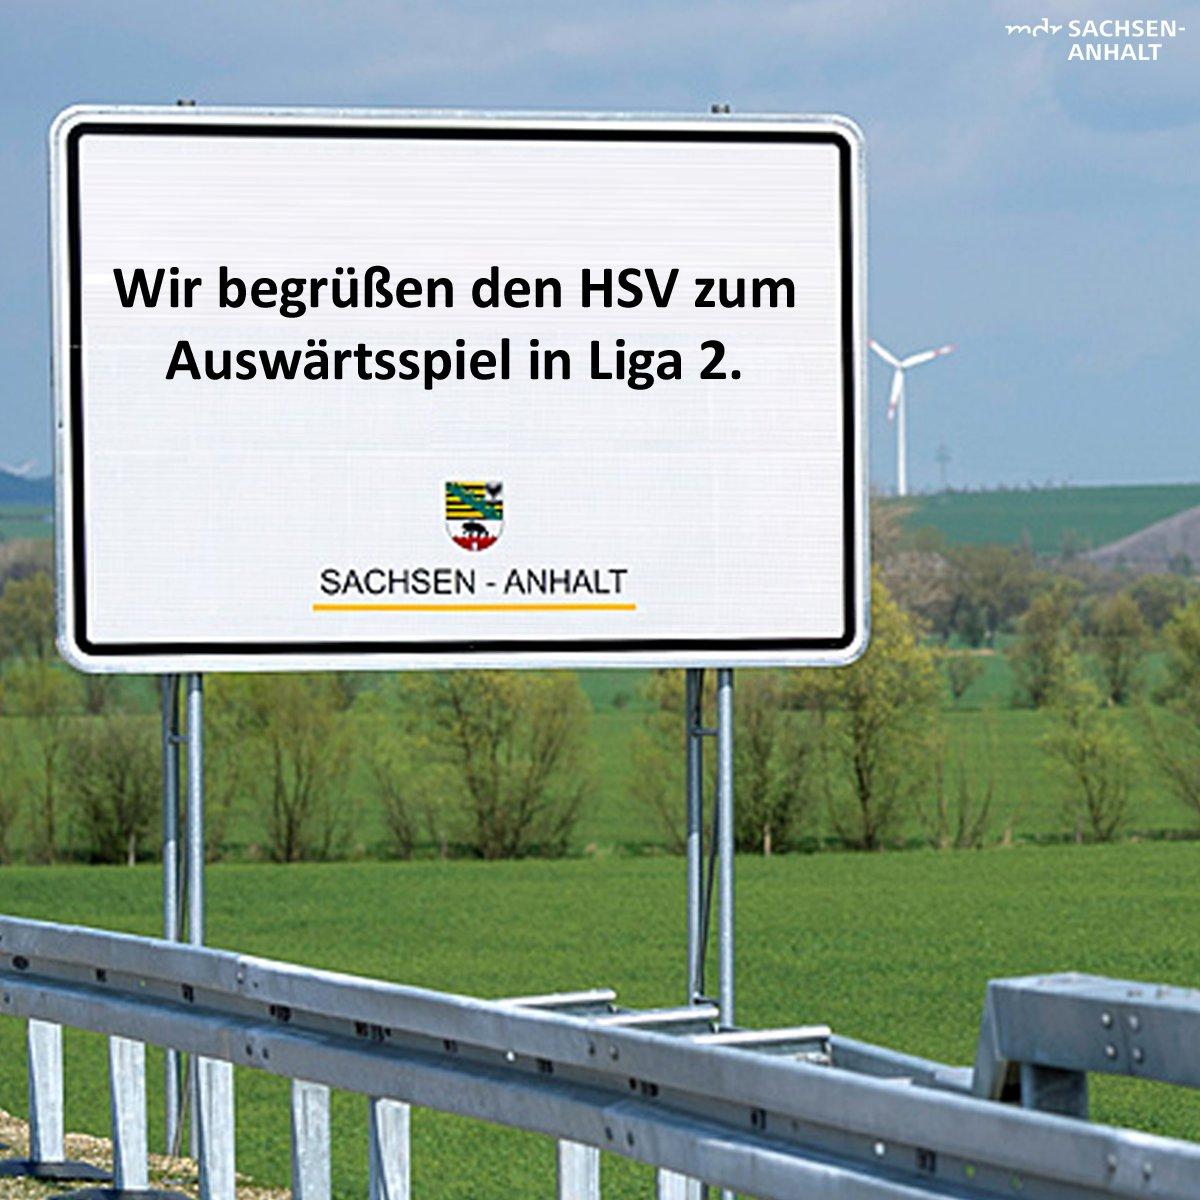 germanrobotics.de